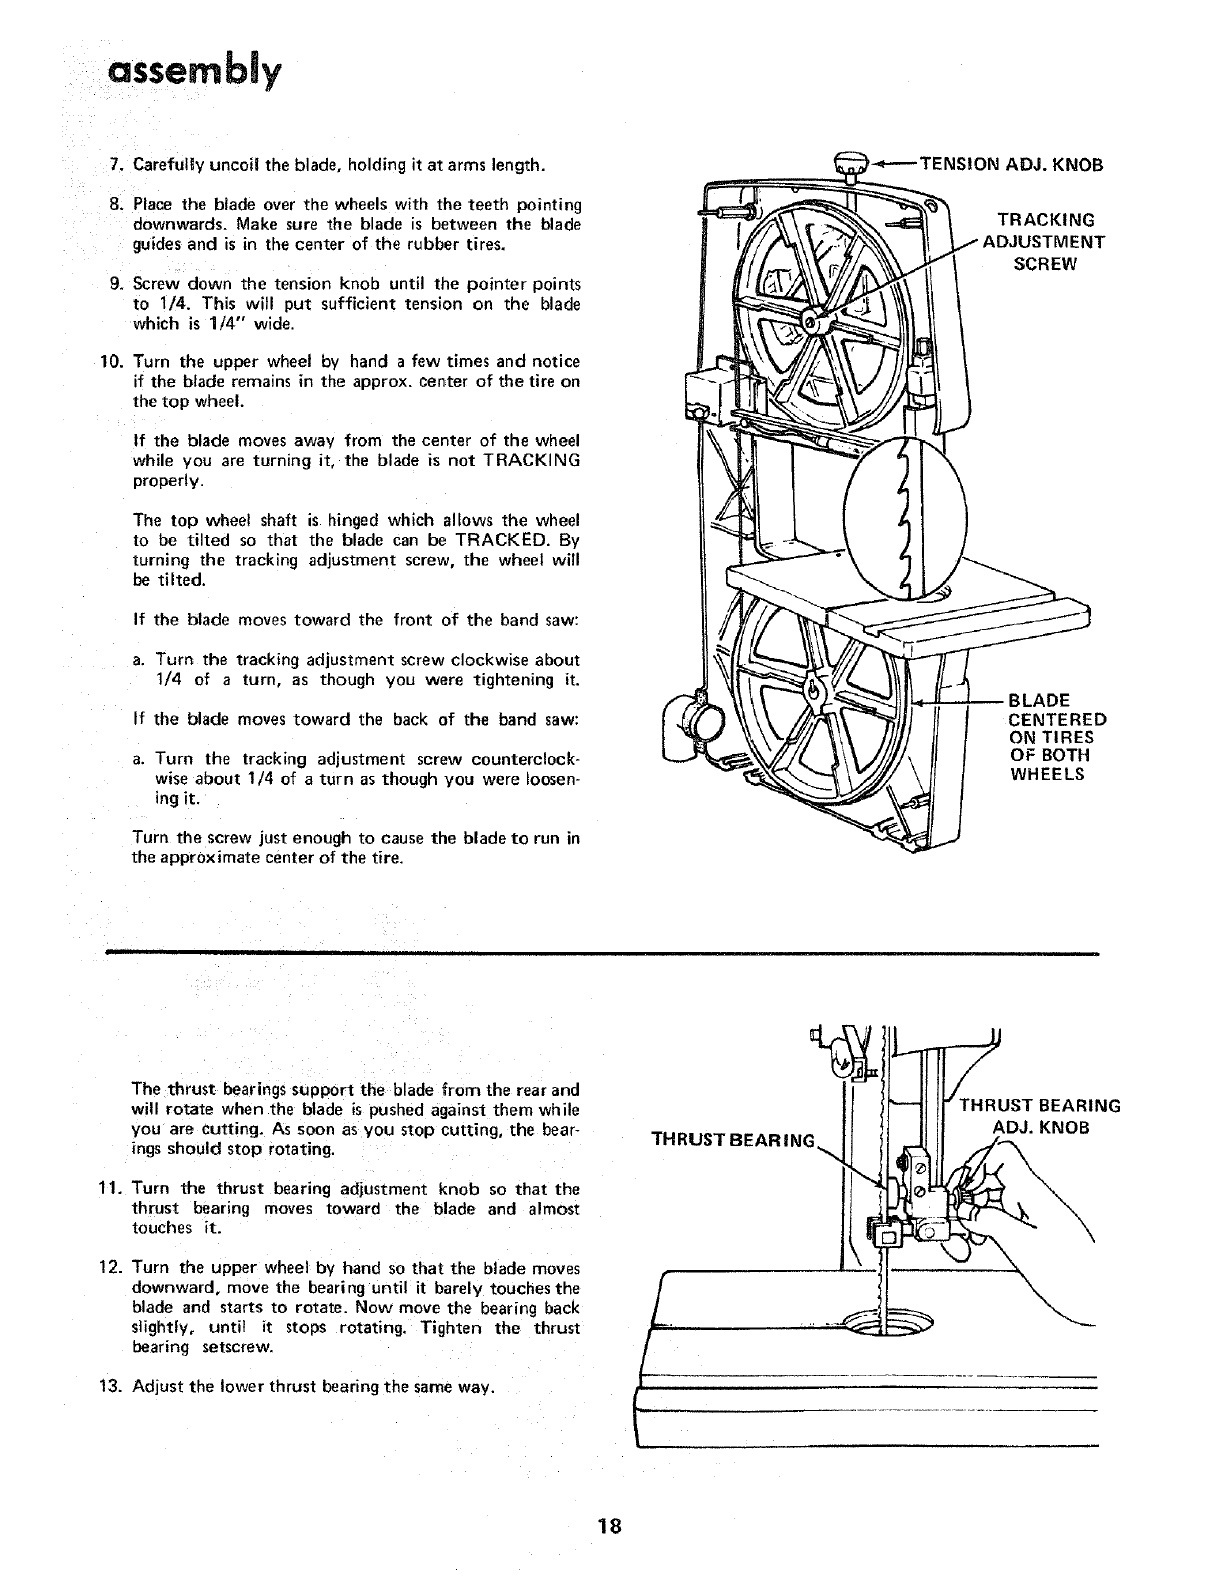 Craftsman 11324201 User Manual 12 INCH BAND SAW Manuals